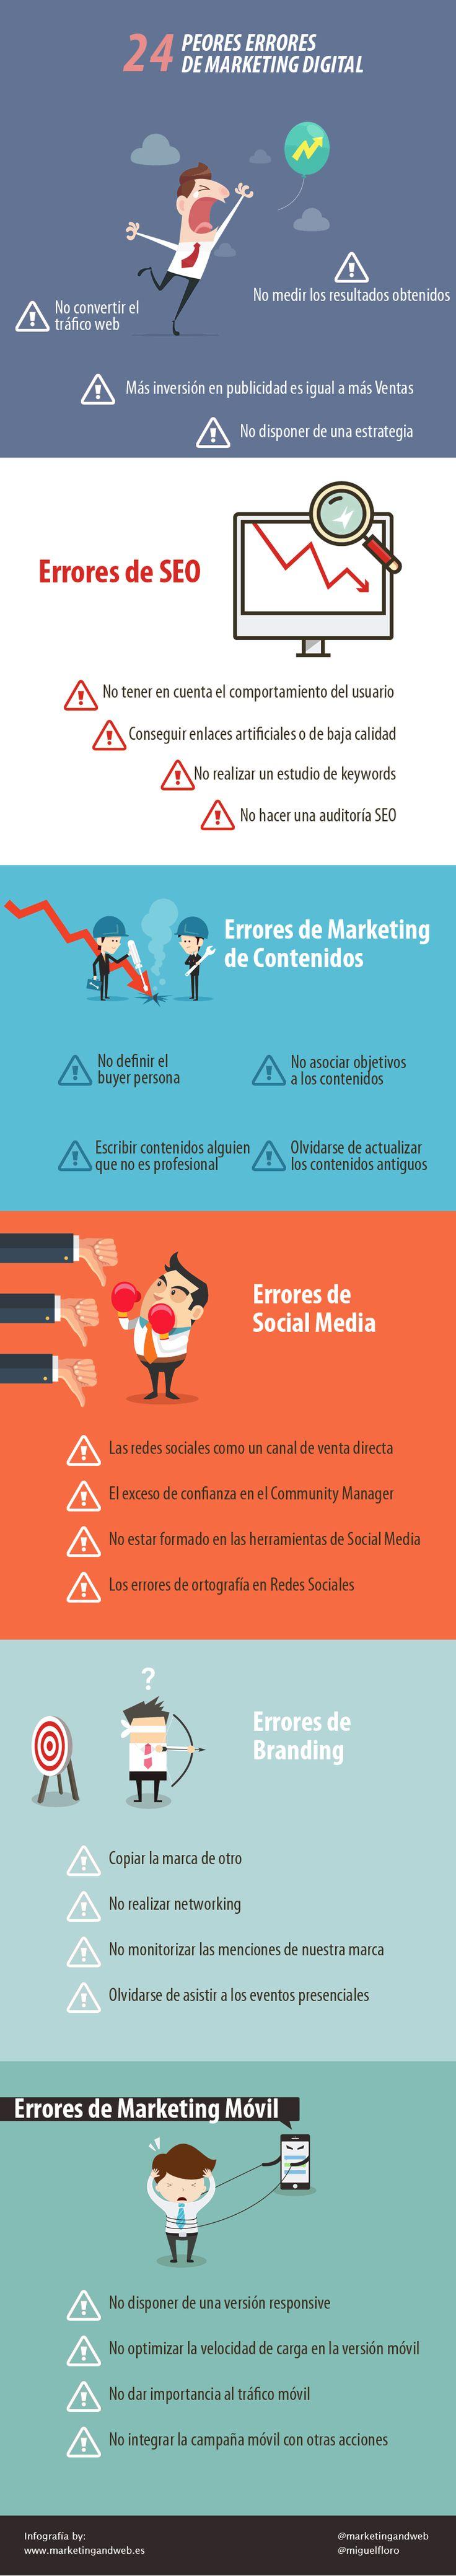 24 peores errores de Marketing Digital